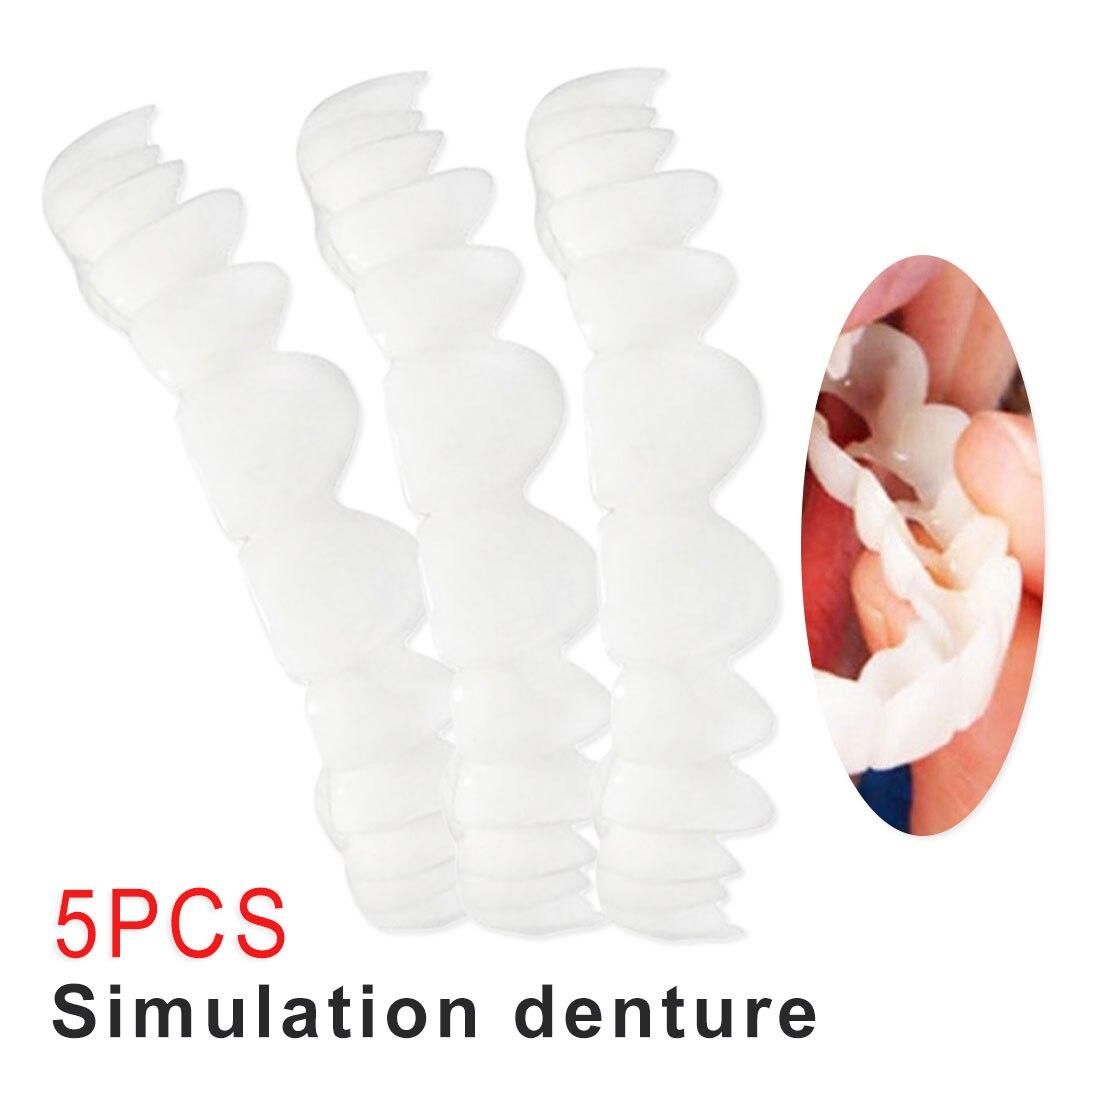 5pcs Temporary Smile Comfort Fit Cosmetic Teeth Denture Teeth Top Cosmetic Veneer Dentes White